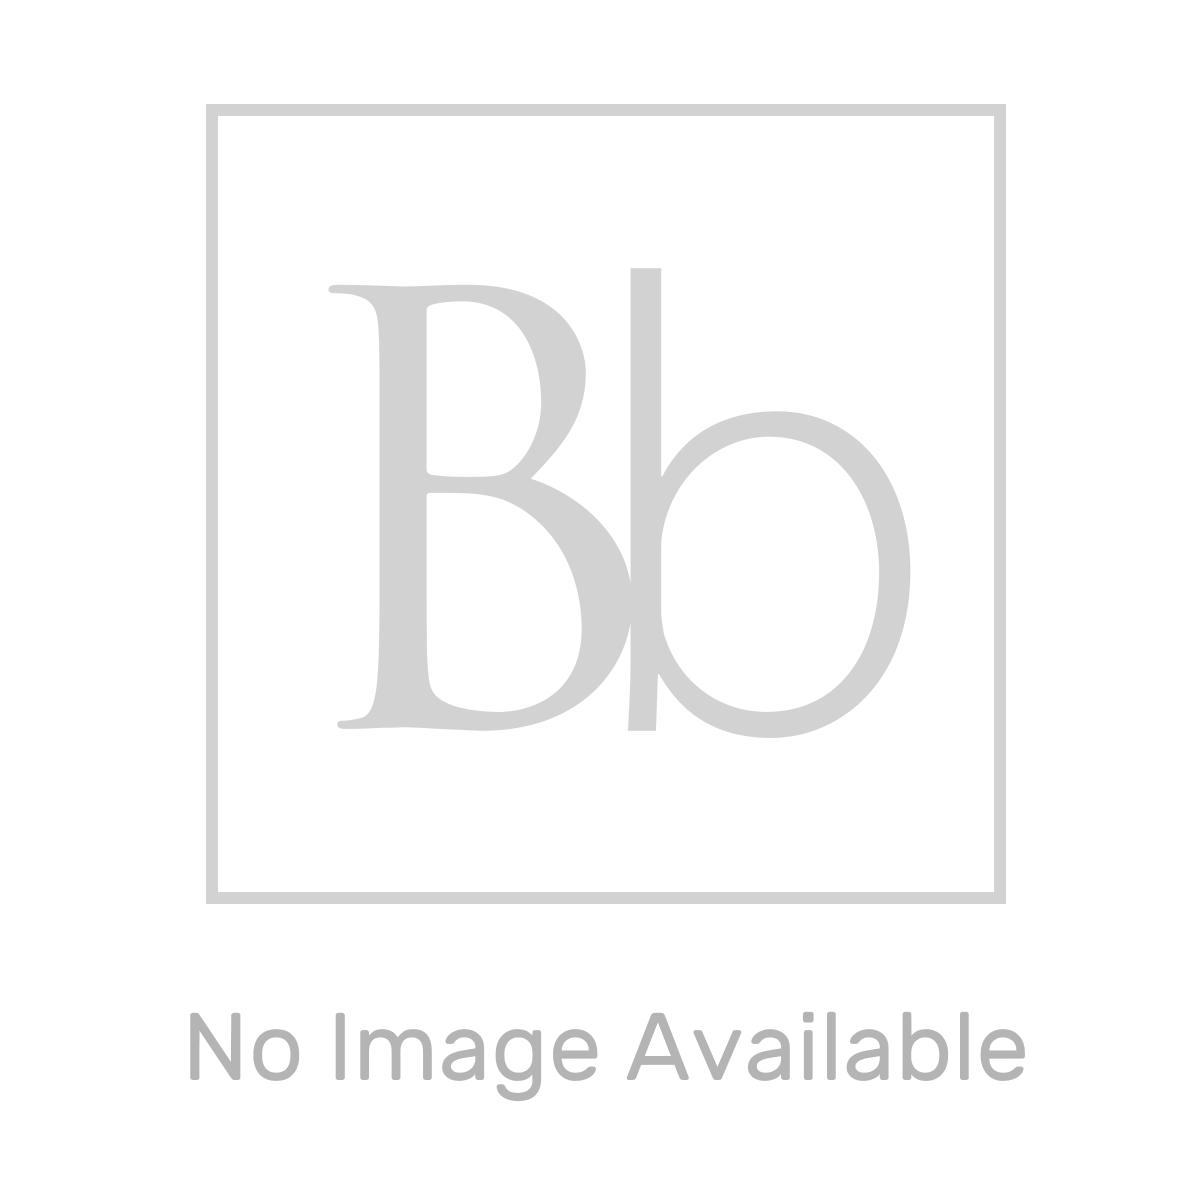 RAK Feeling Greige Rectangular Shower Tray 1700 x 800mm Measurements